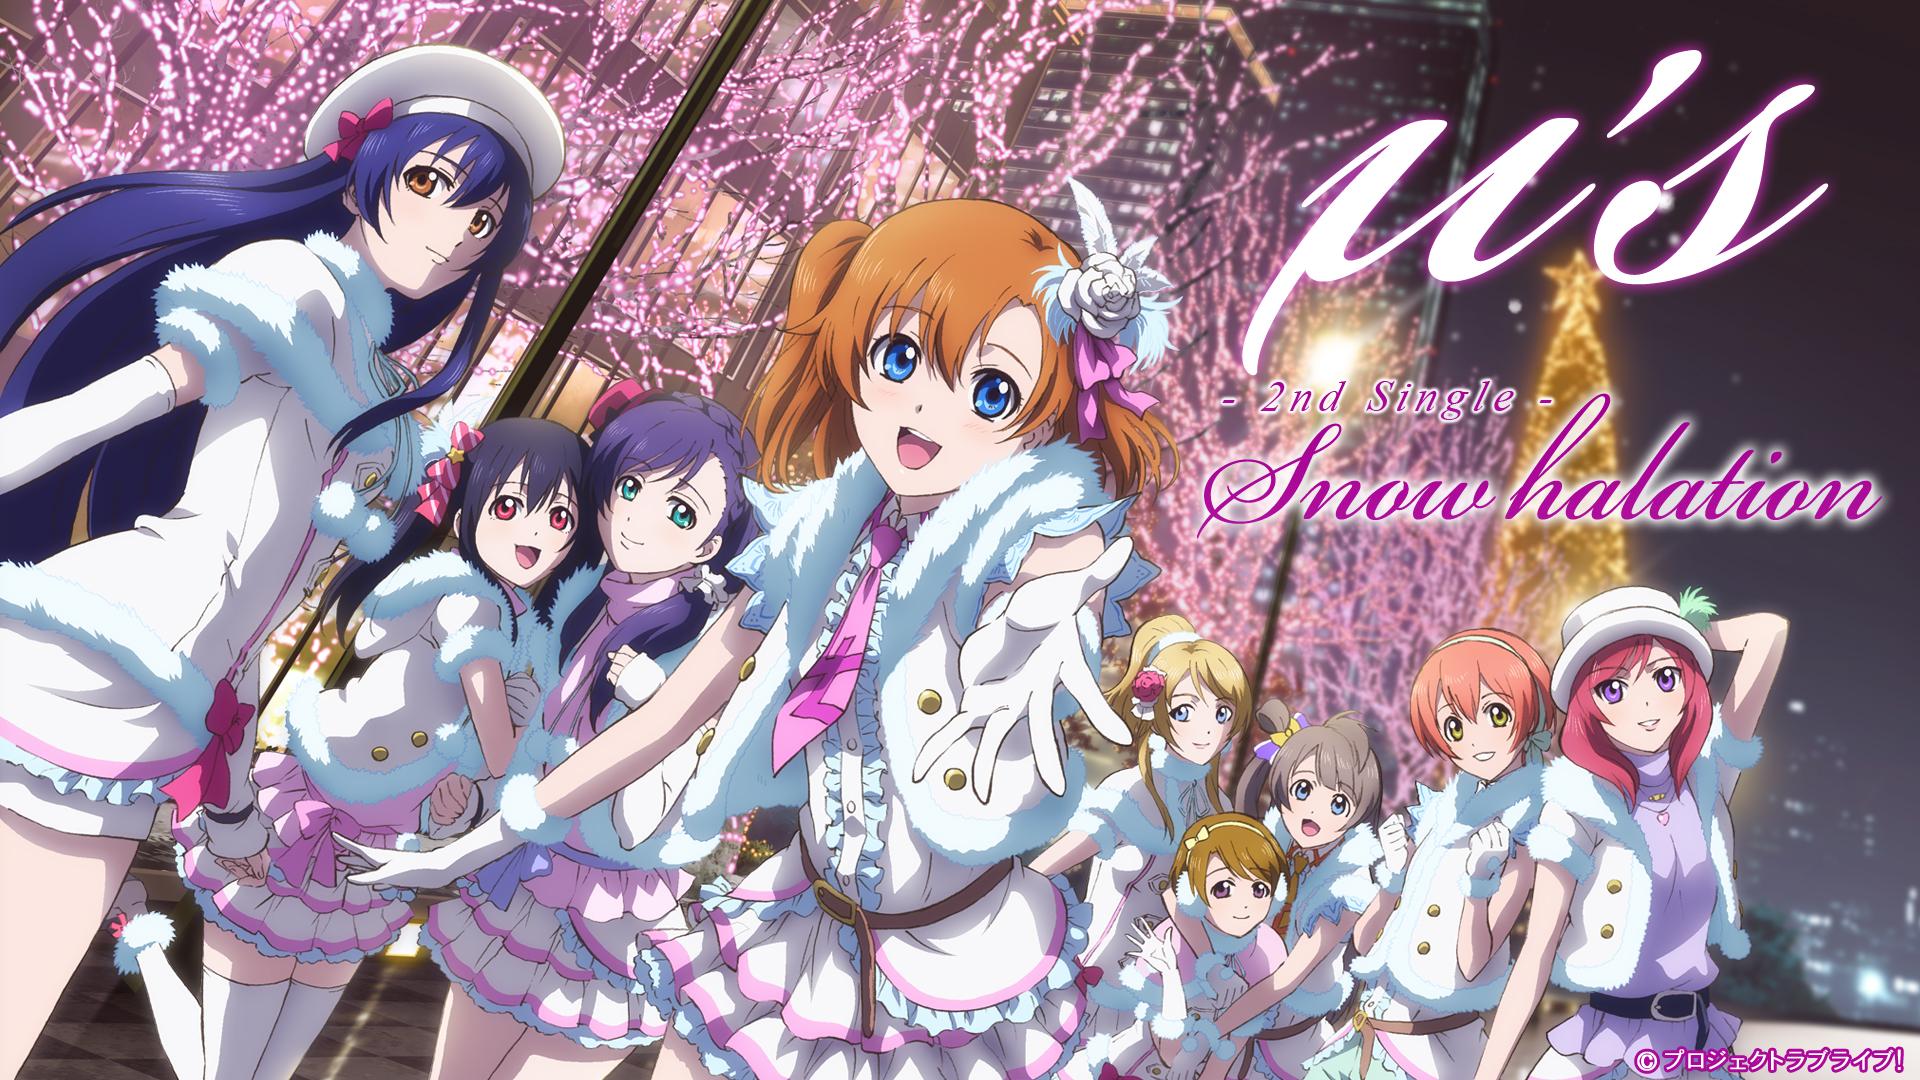 Love Live Wallpaper Hd New: U's 2nd Single- Snow Halation Full HD Wallpaper And